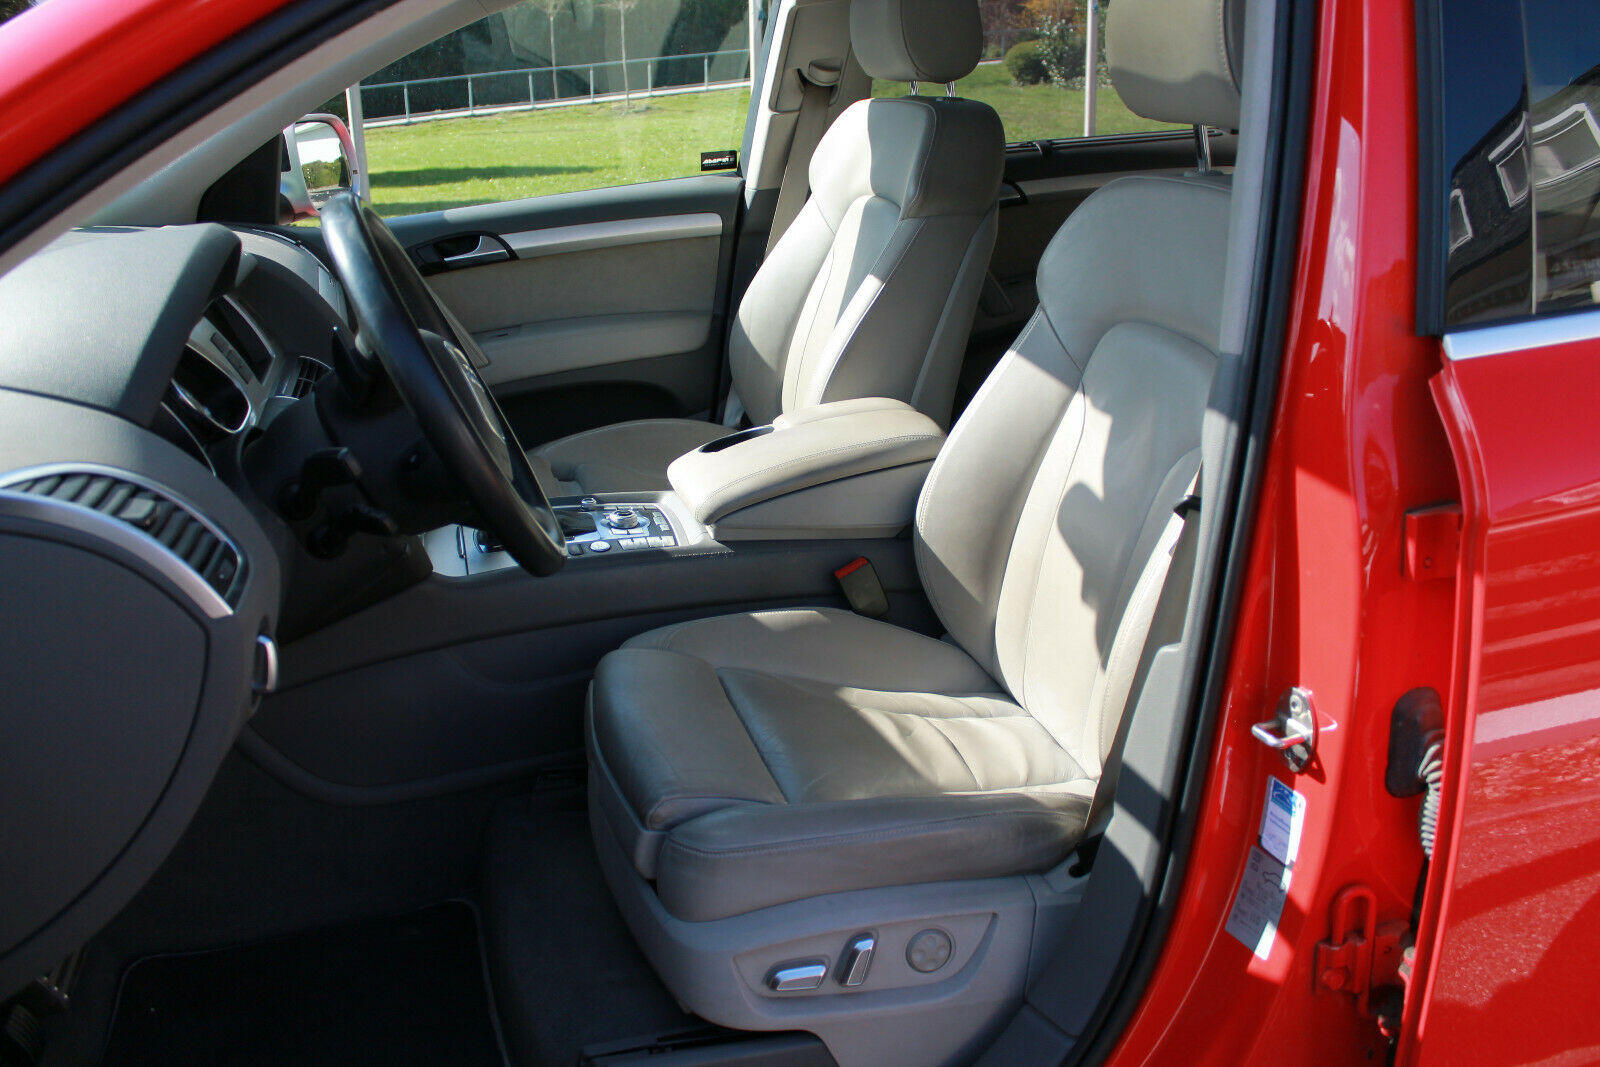 Audi Q7 V12 TDI sièges